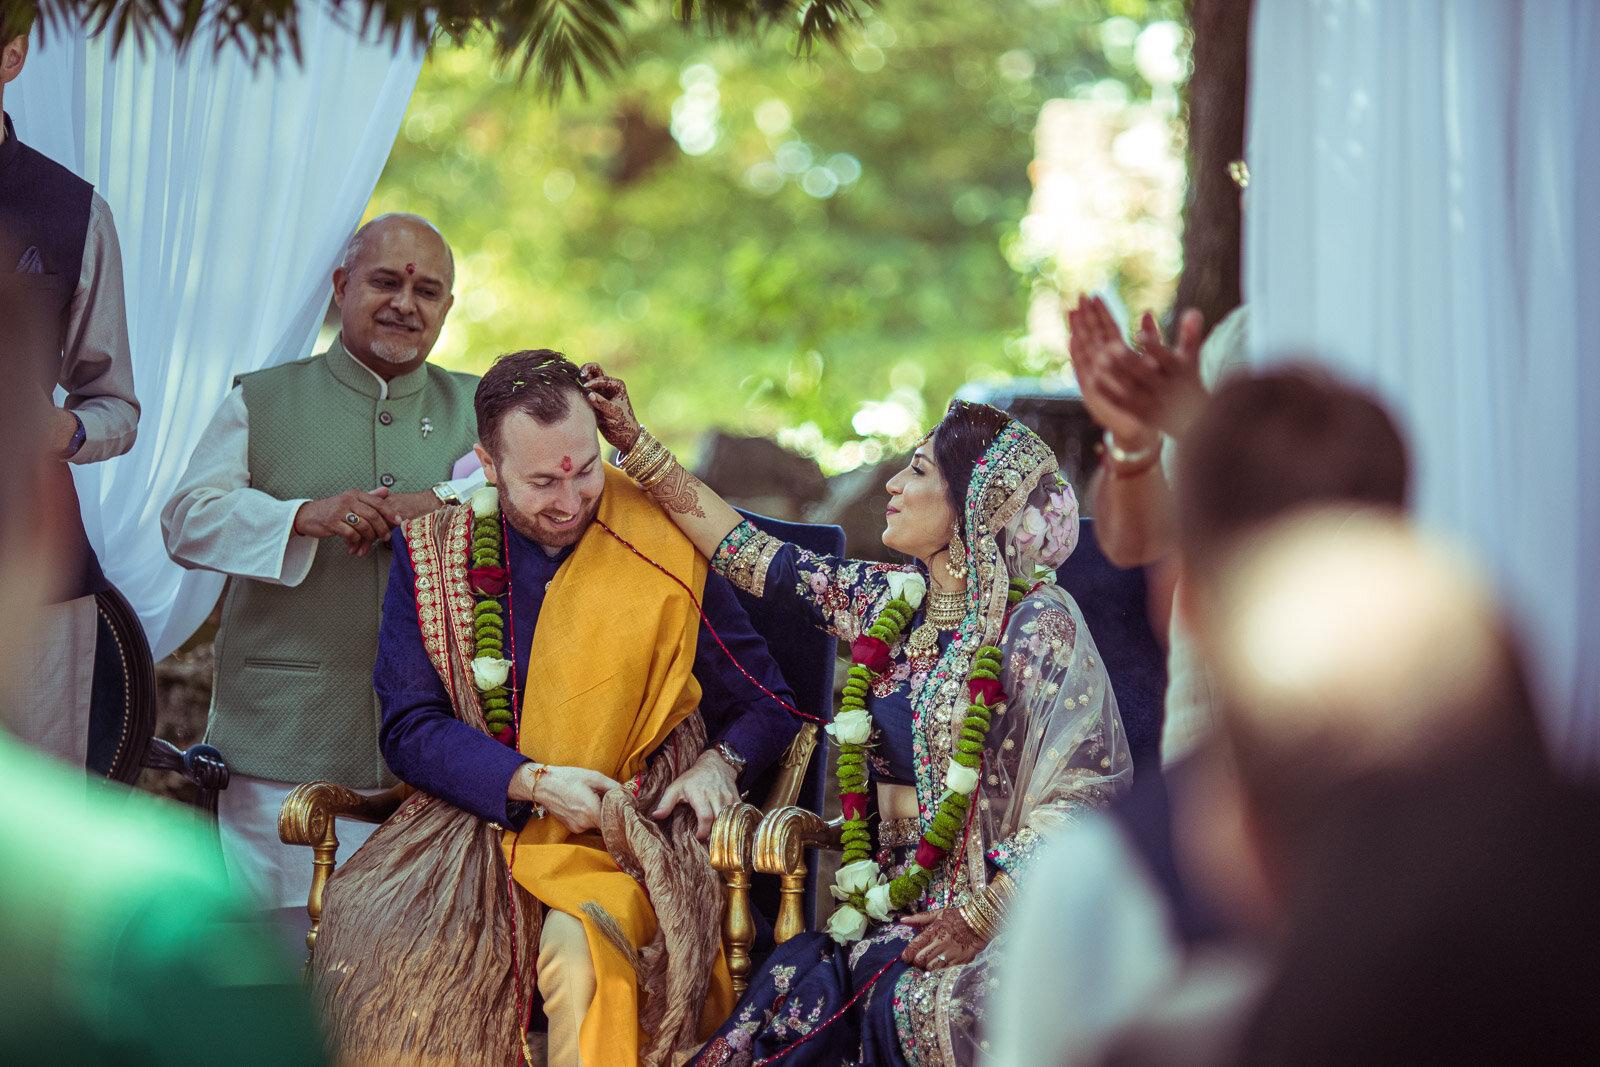 Destination Indian Wedding in Borgo San Faustino 19.jpg